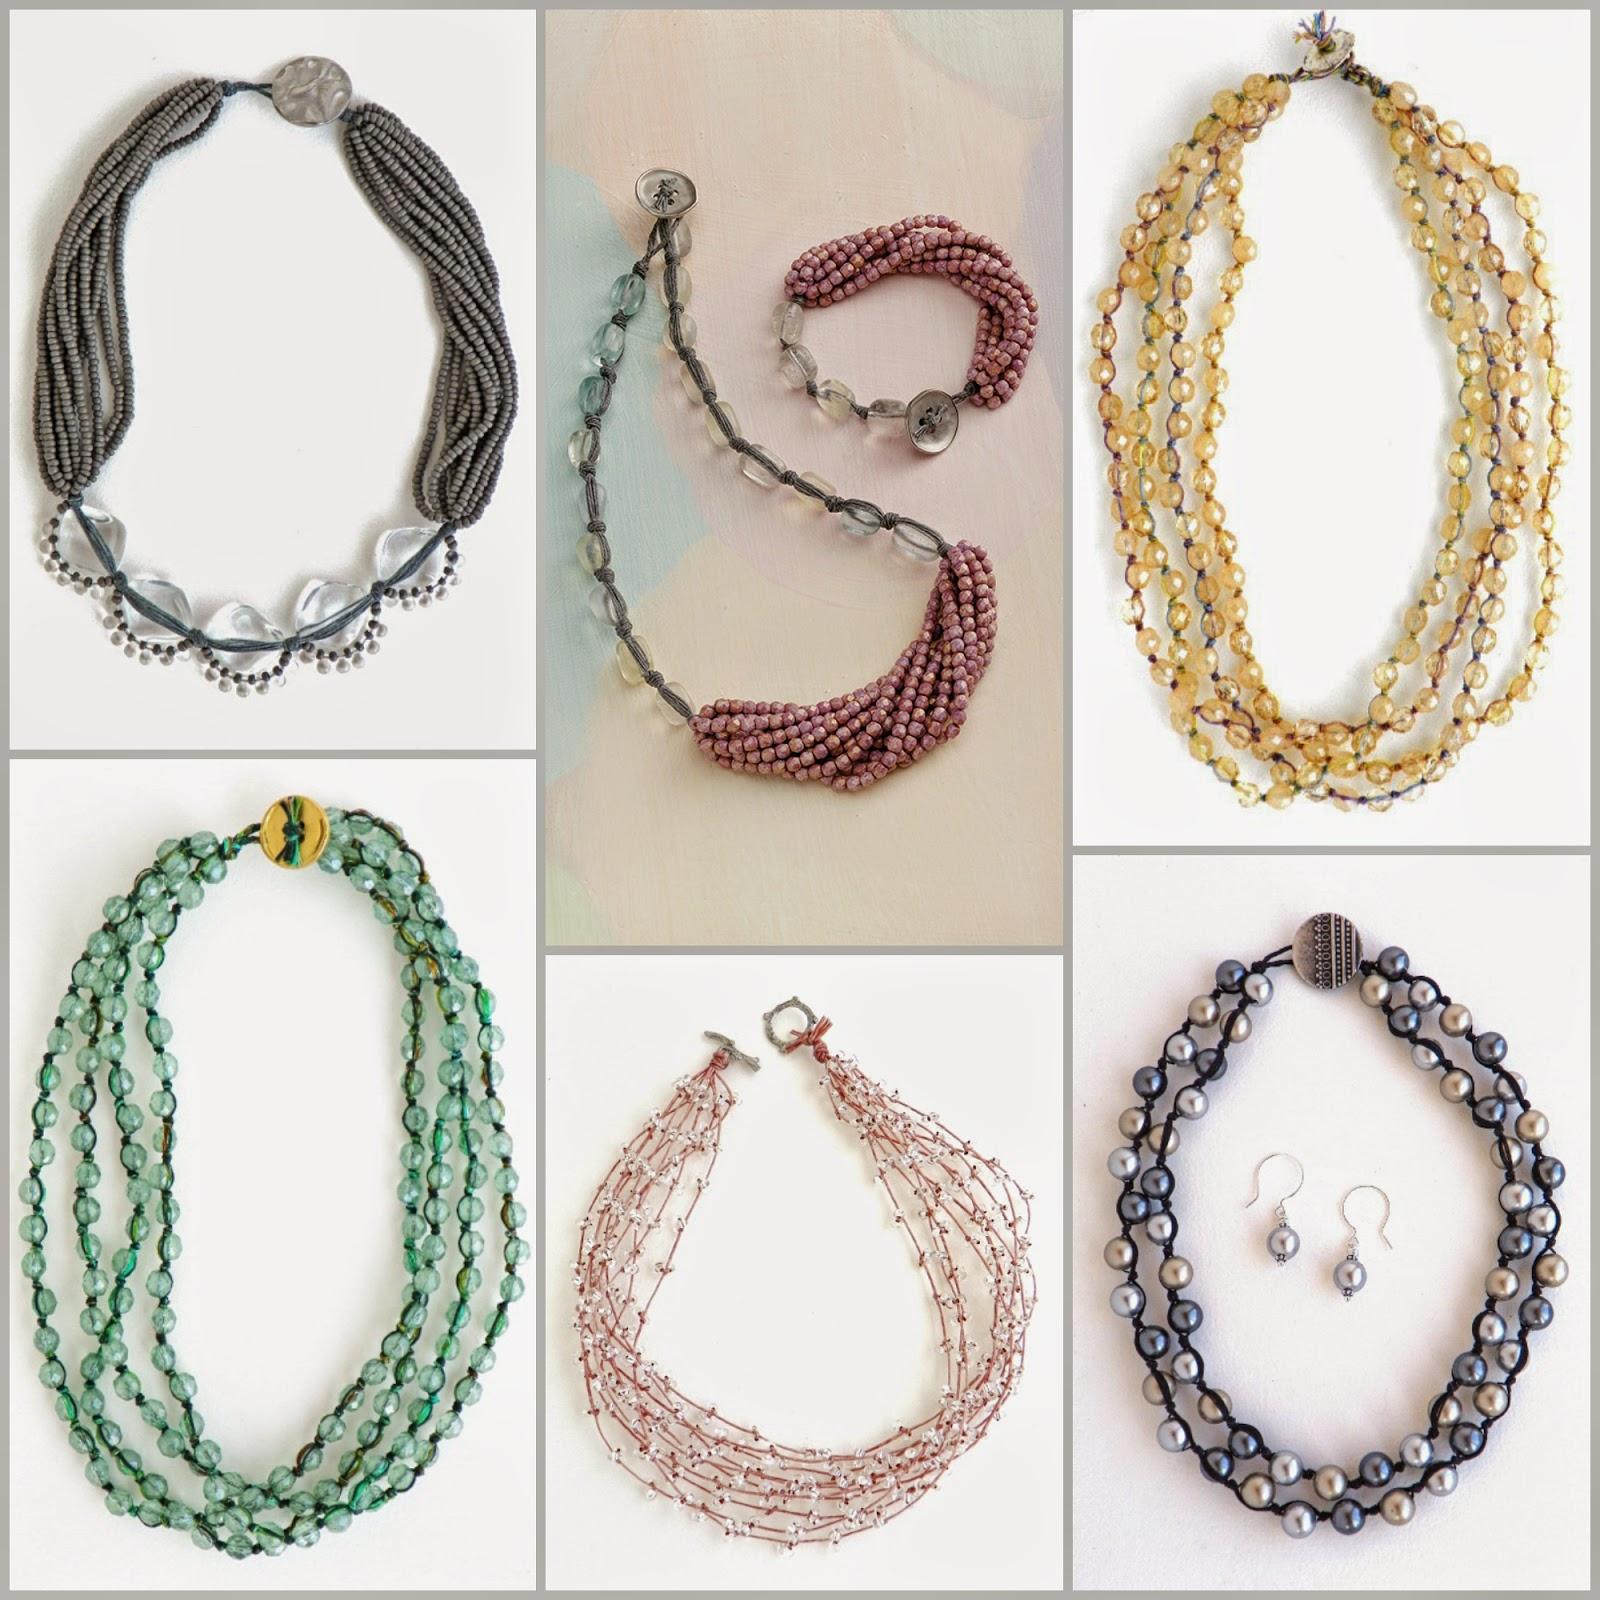 Linen Jewellery: Erin Siegel Jewelry: Waxed Linen Jewelry, Tutorials And